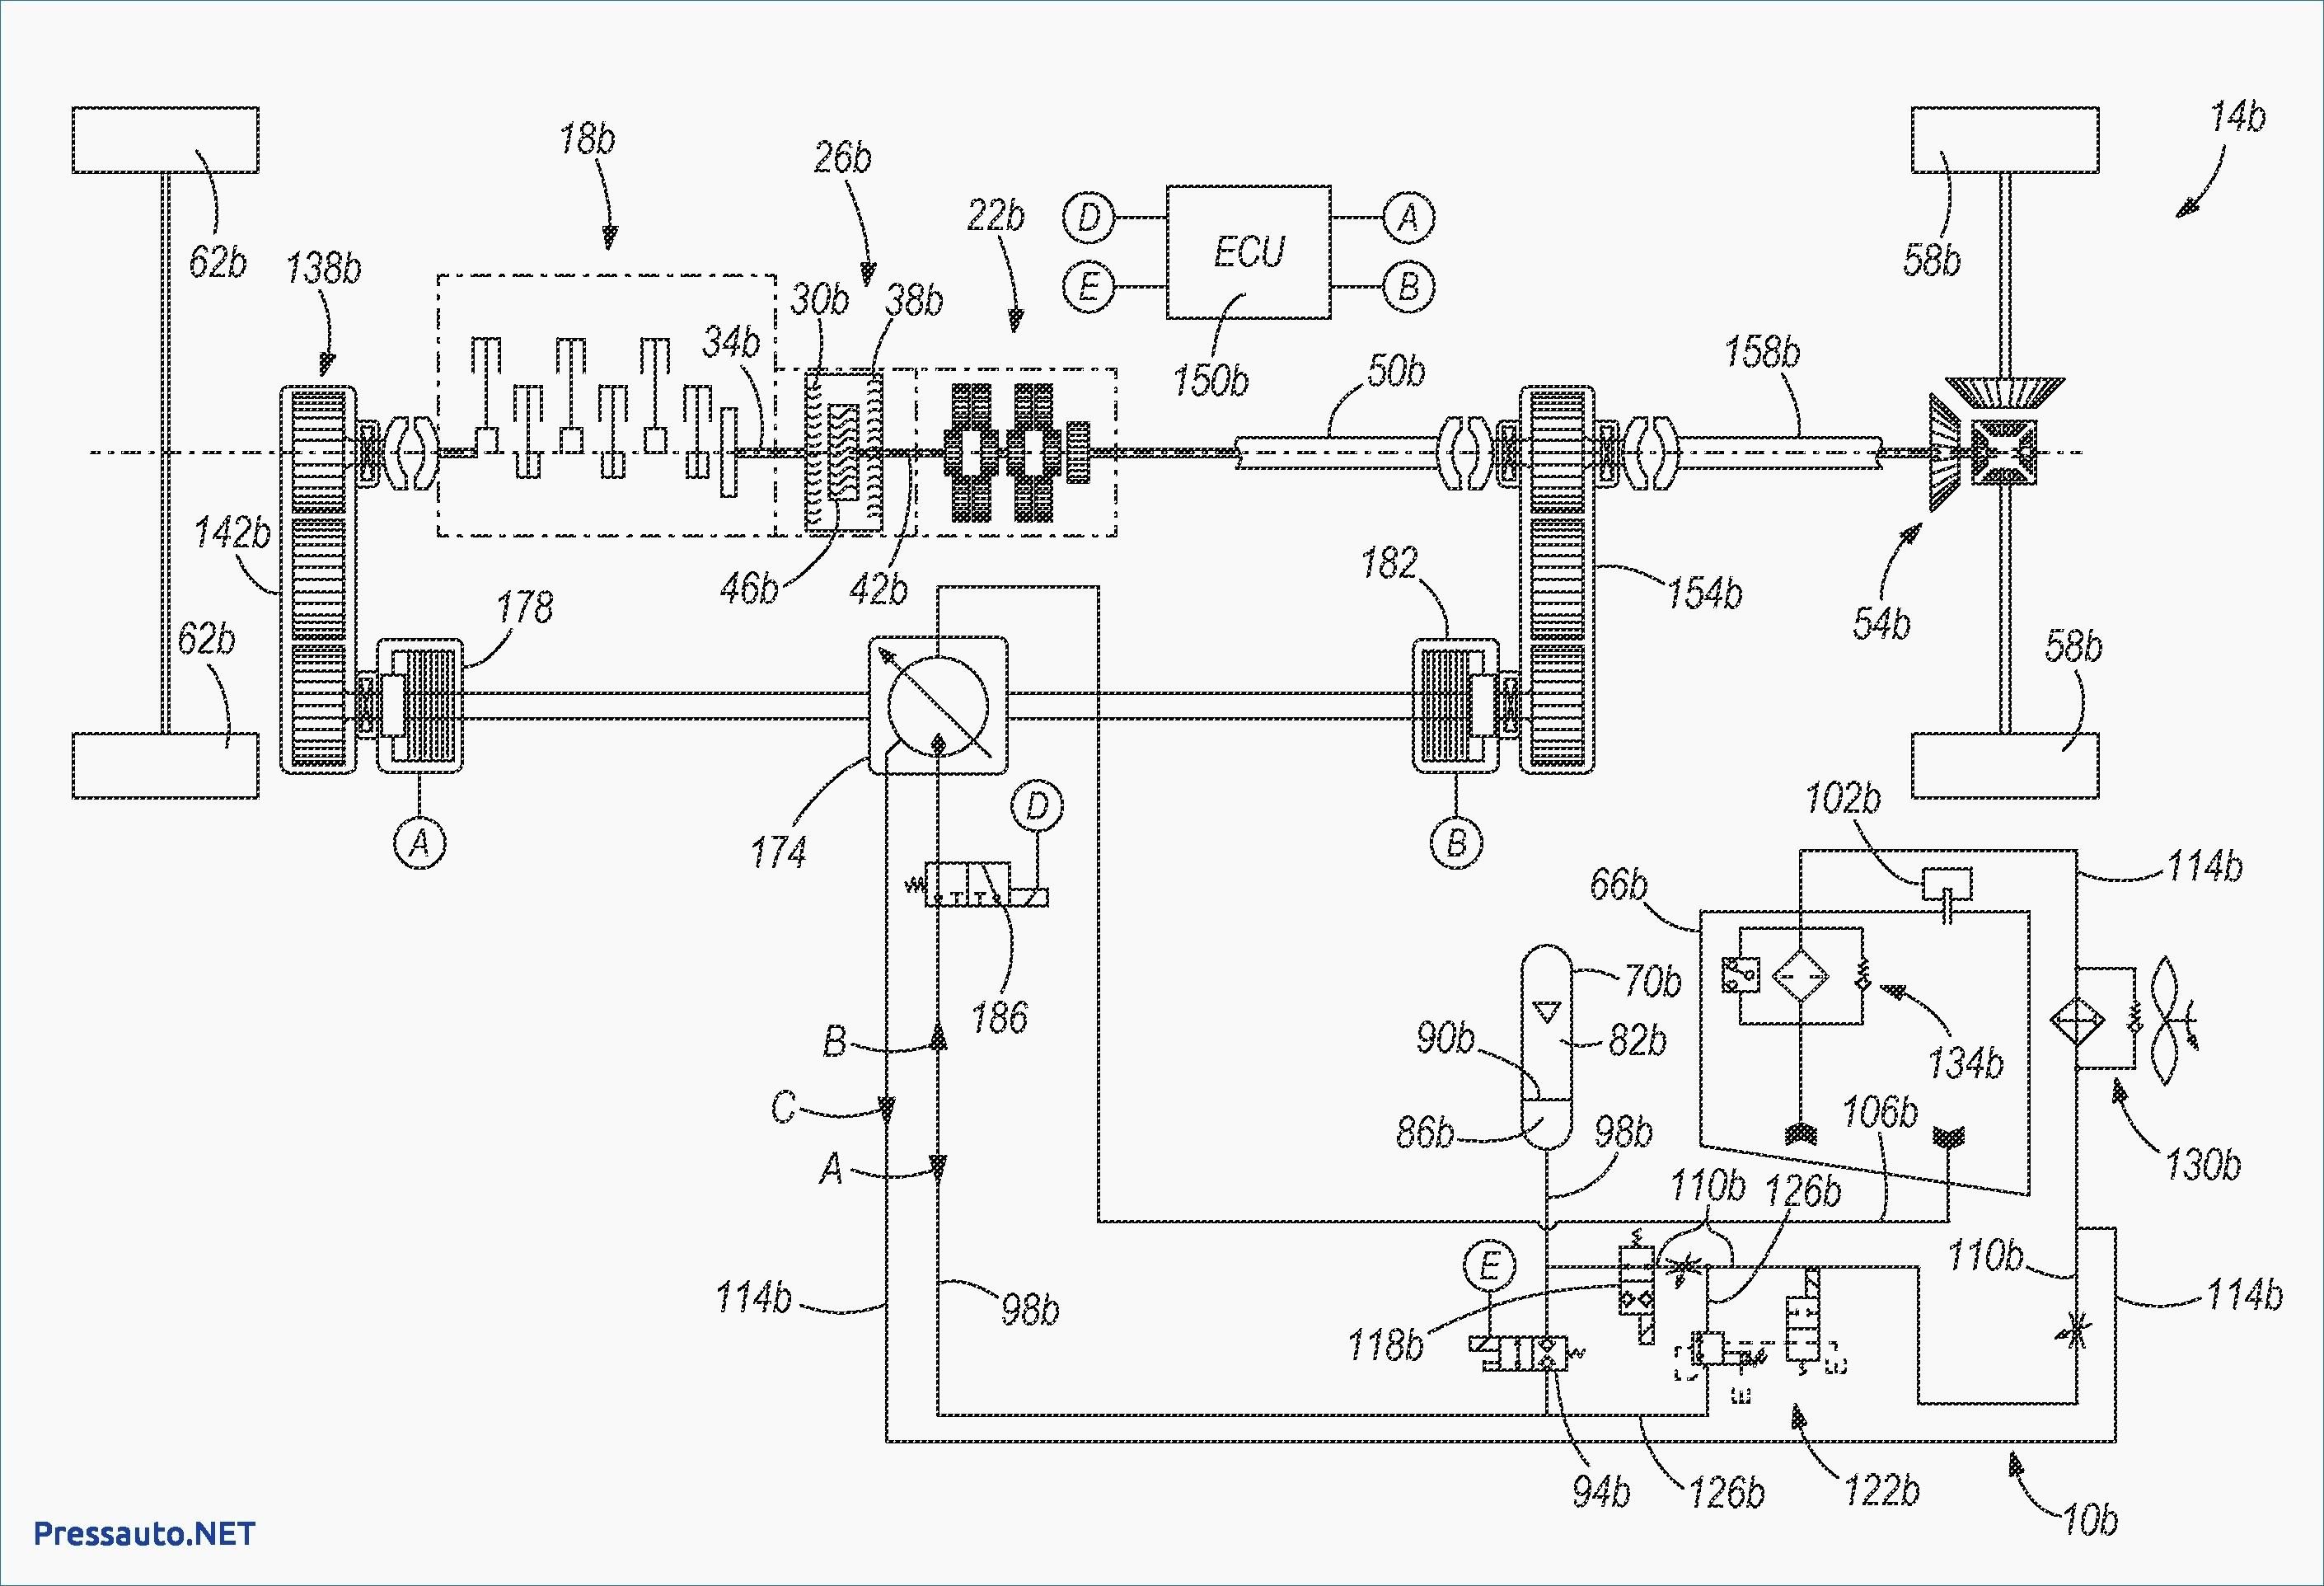 mahindra 2216 wiring diagram all wiring diagram  mahindra 2216 wiring diagram #2